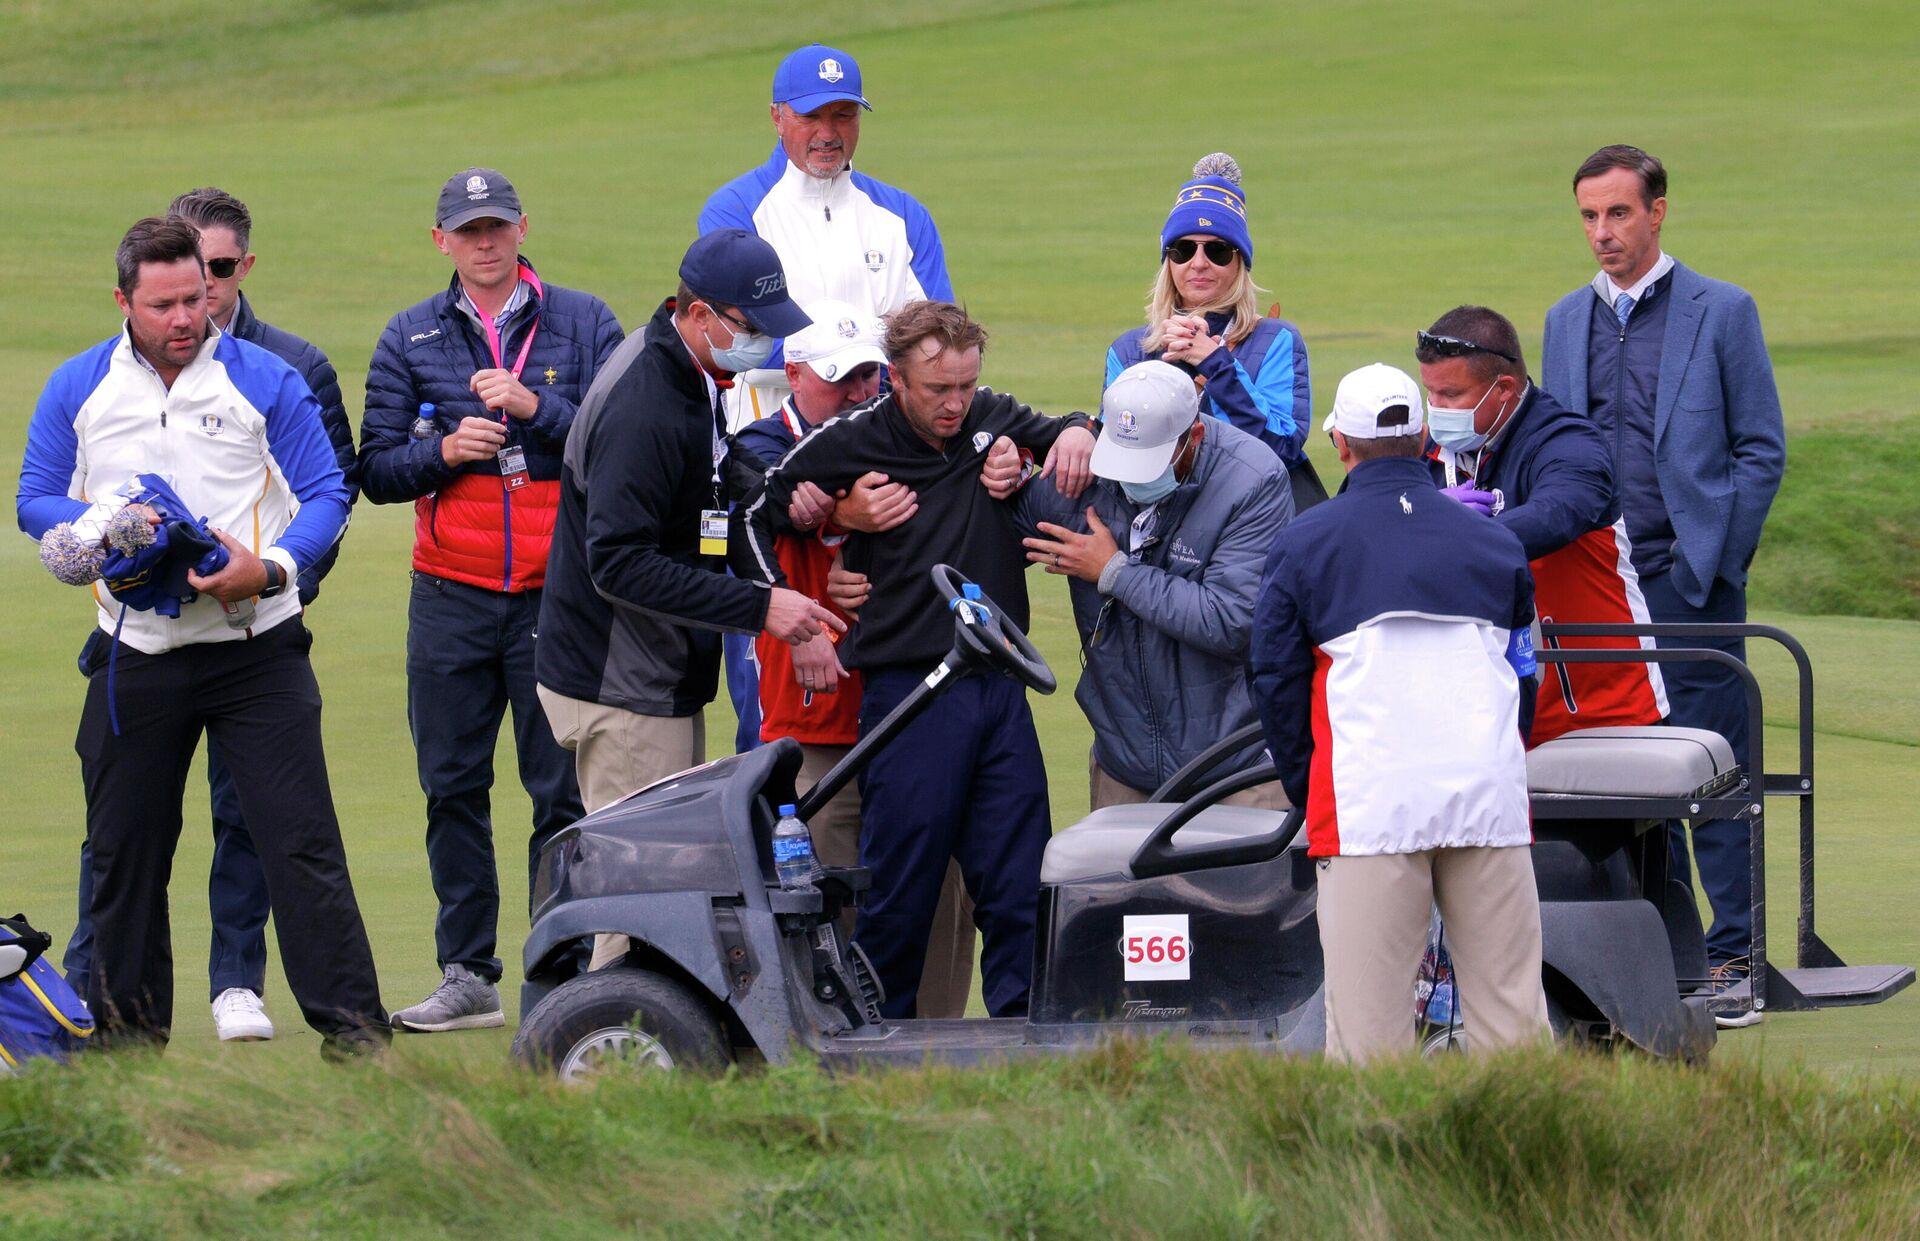 Golf - The 2020 Ryder Cup - Whistling Straits, Sheboygan, Wisconsin, U.S. - September 23, 2021 Actor Tom Felton receives medical attention during a practice round - Sputnik International, 1920, 24.09.2021